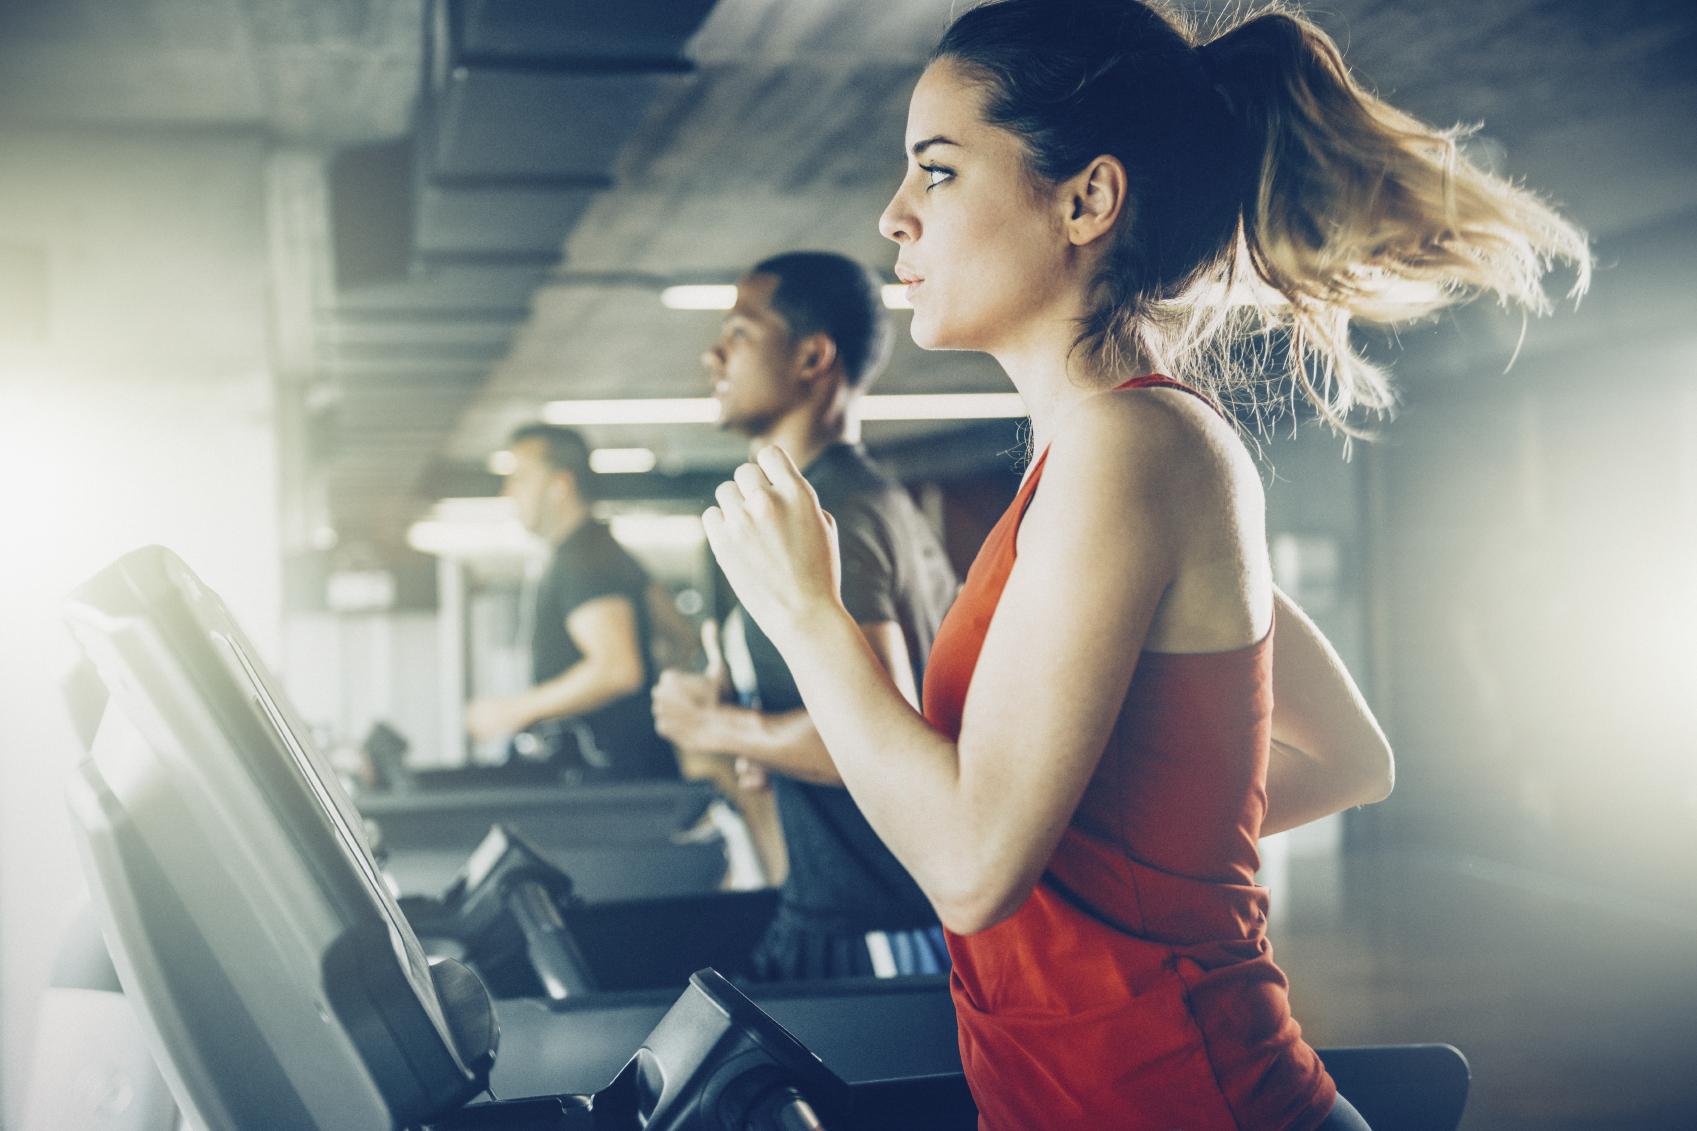 gyms cardio